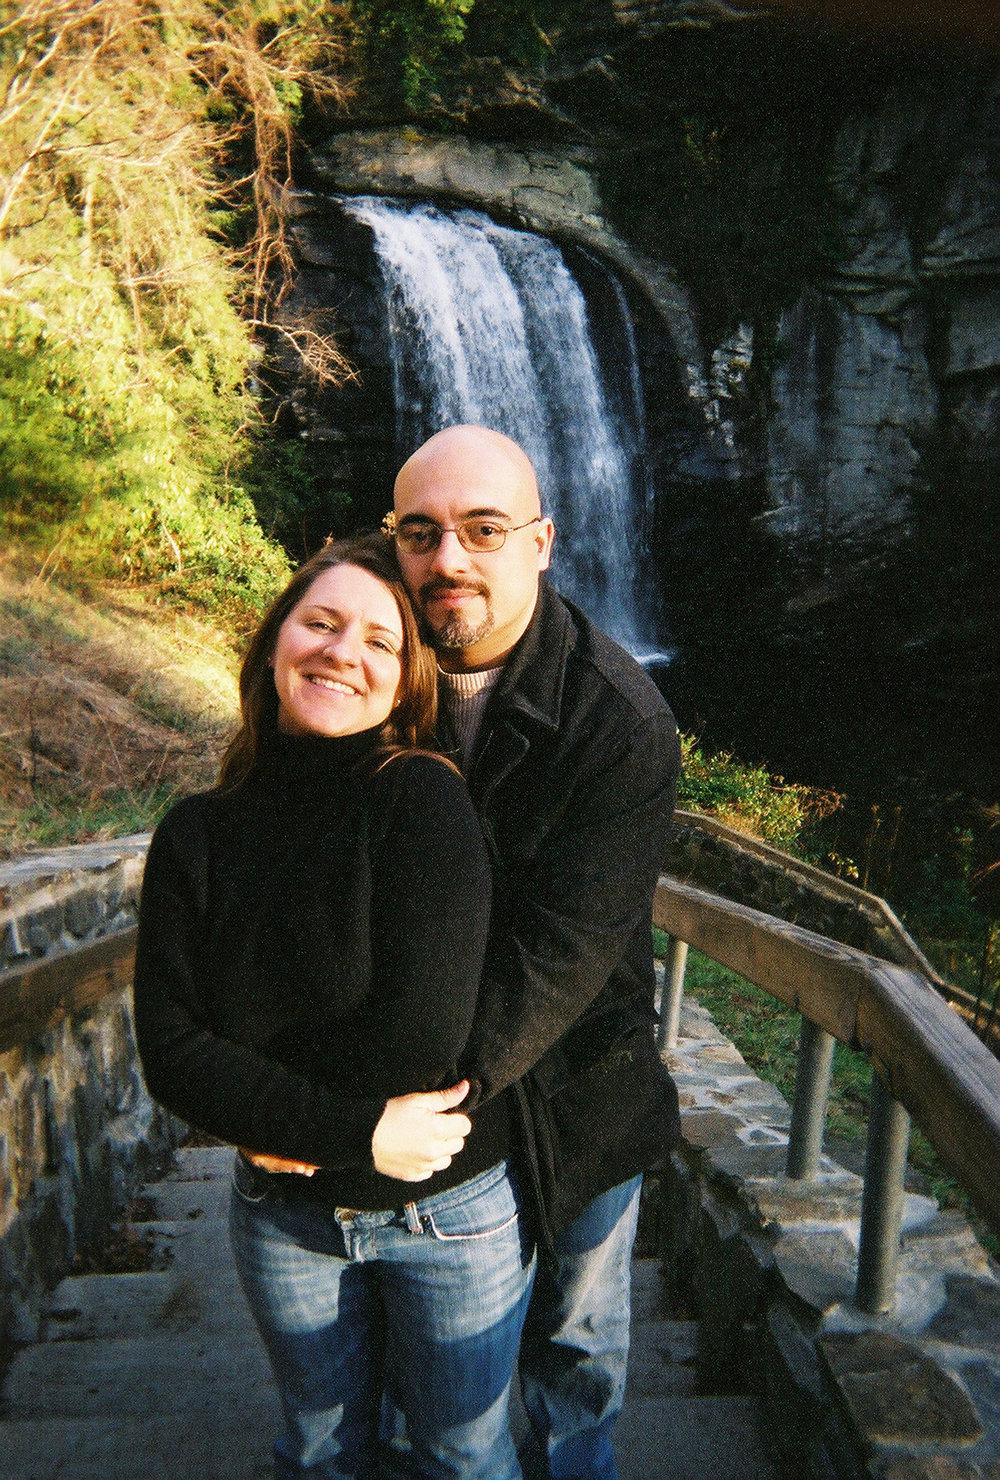 Angela&Rich_at_Falls.jpg